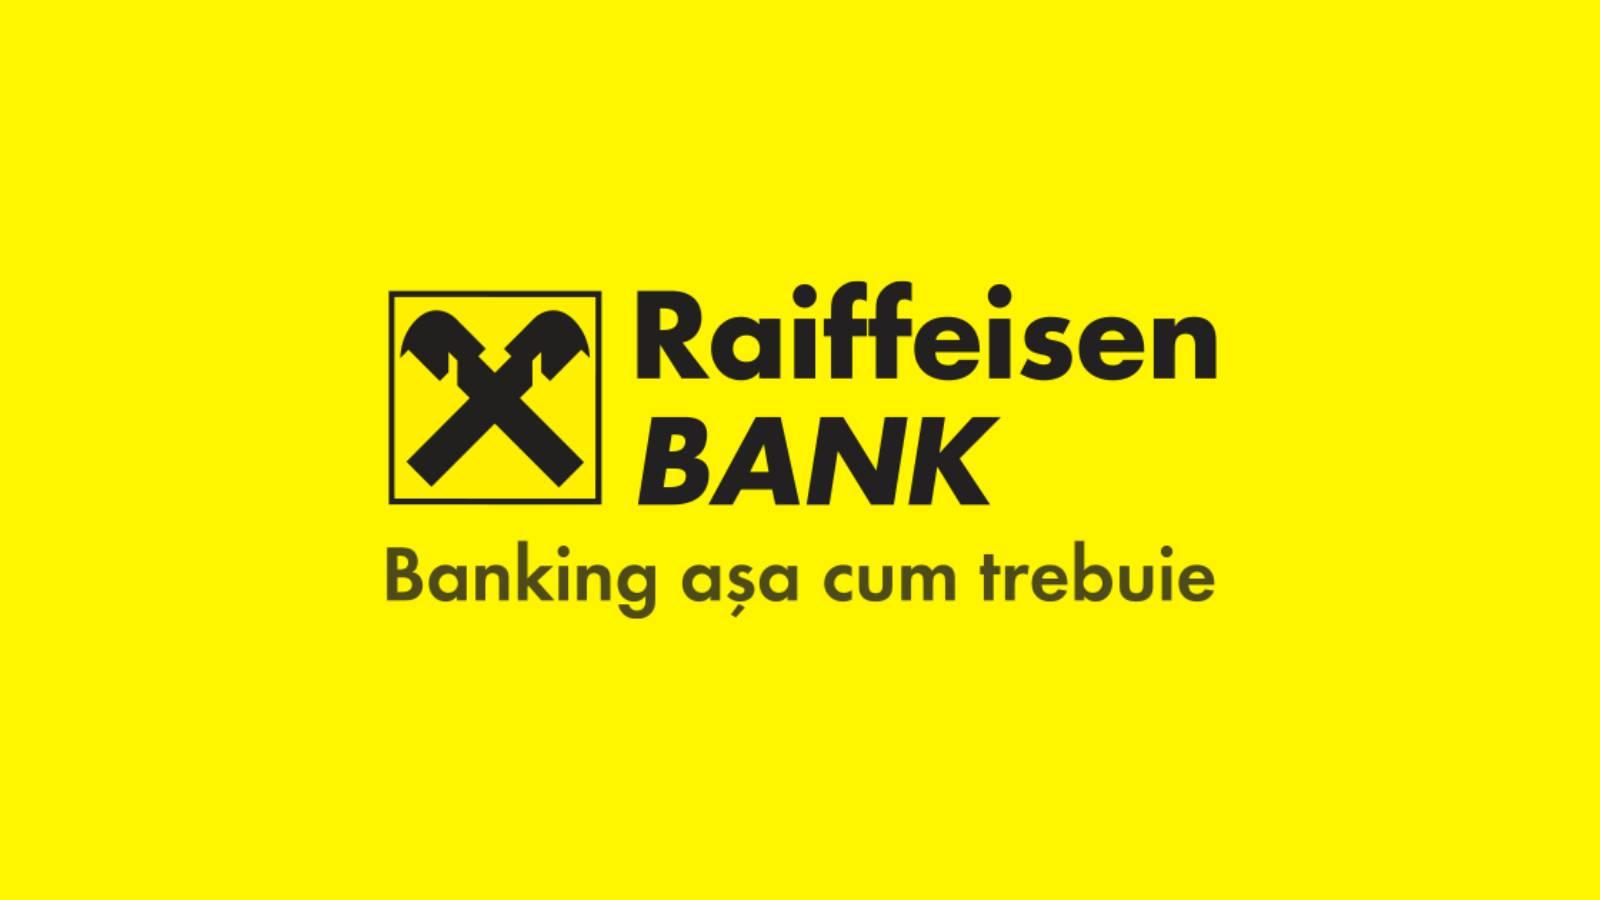 Raiffeisen Bank debit